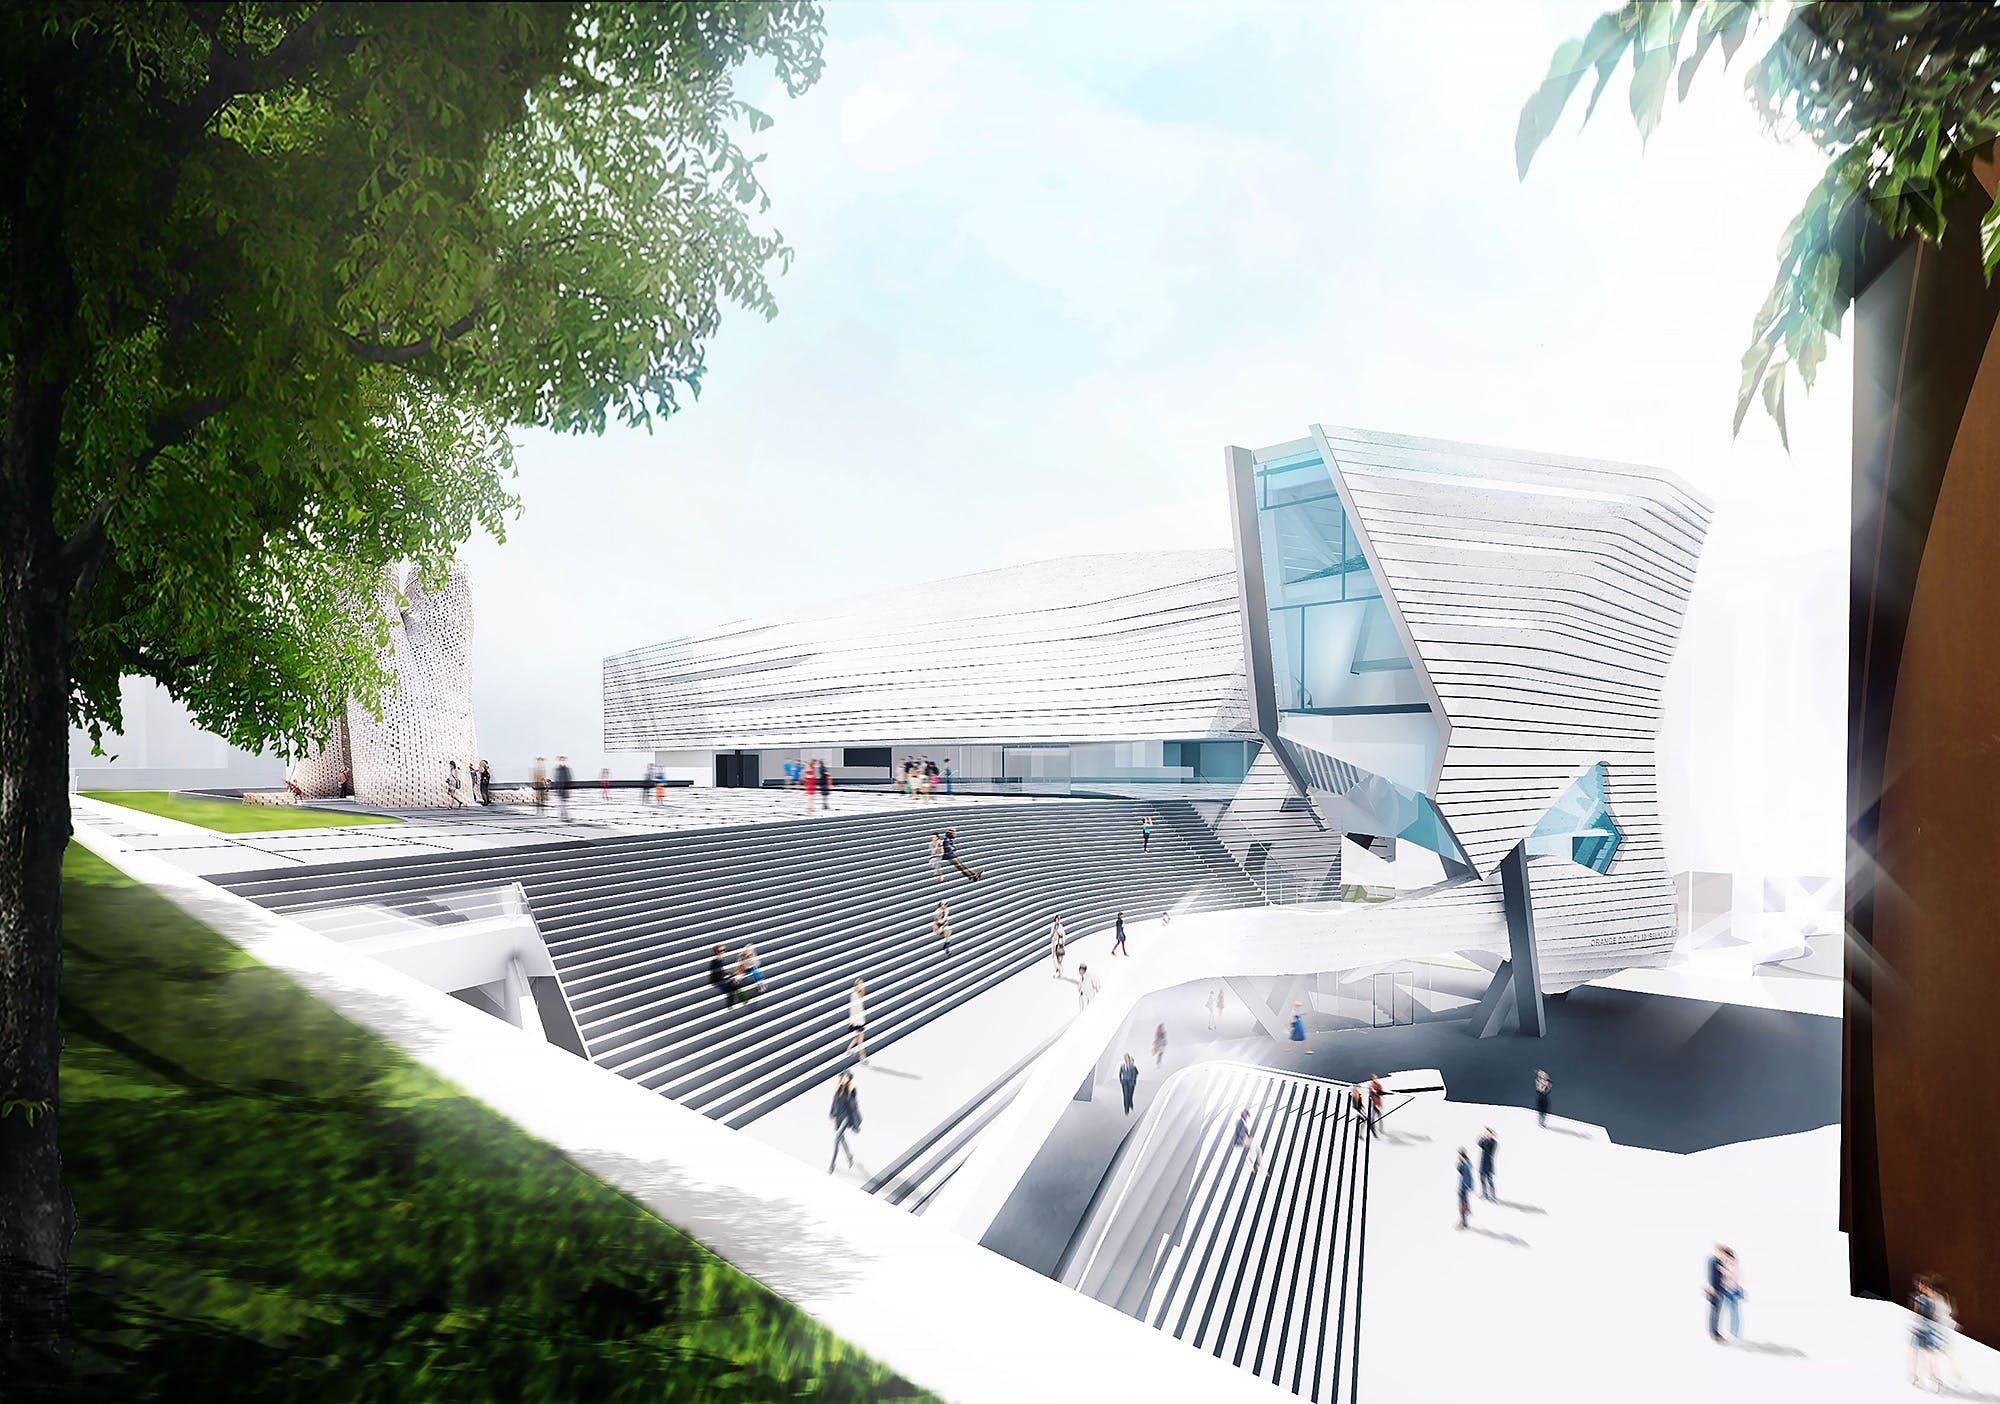 Morphosis Reveals Design For New Orange County Museum Of Art In